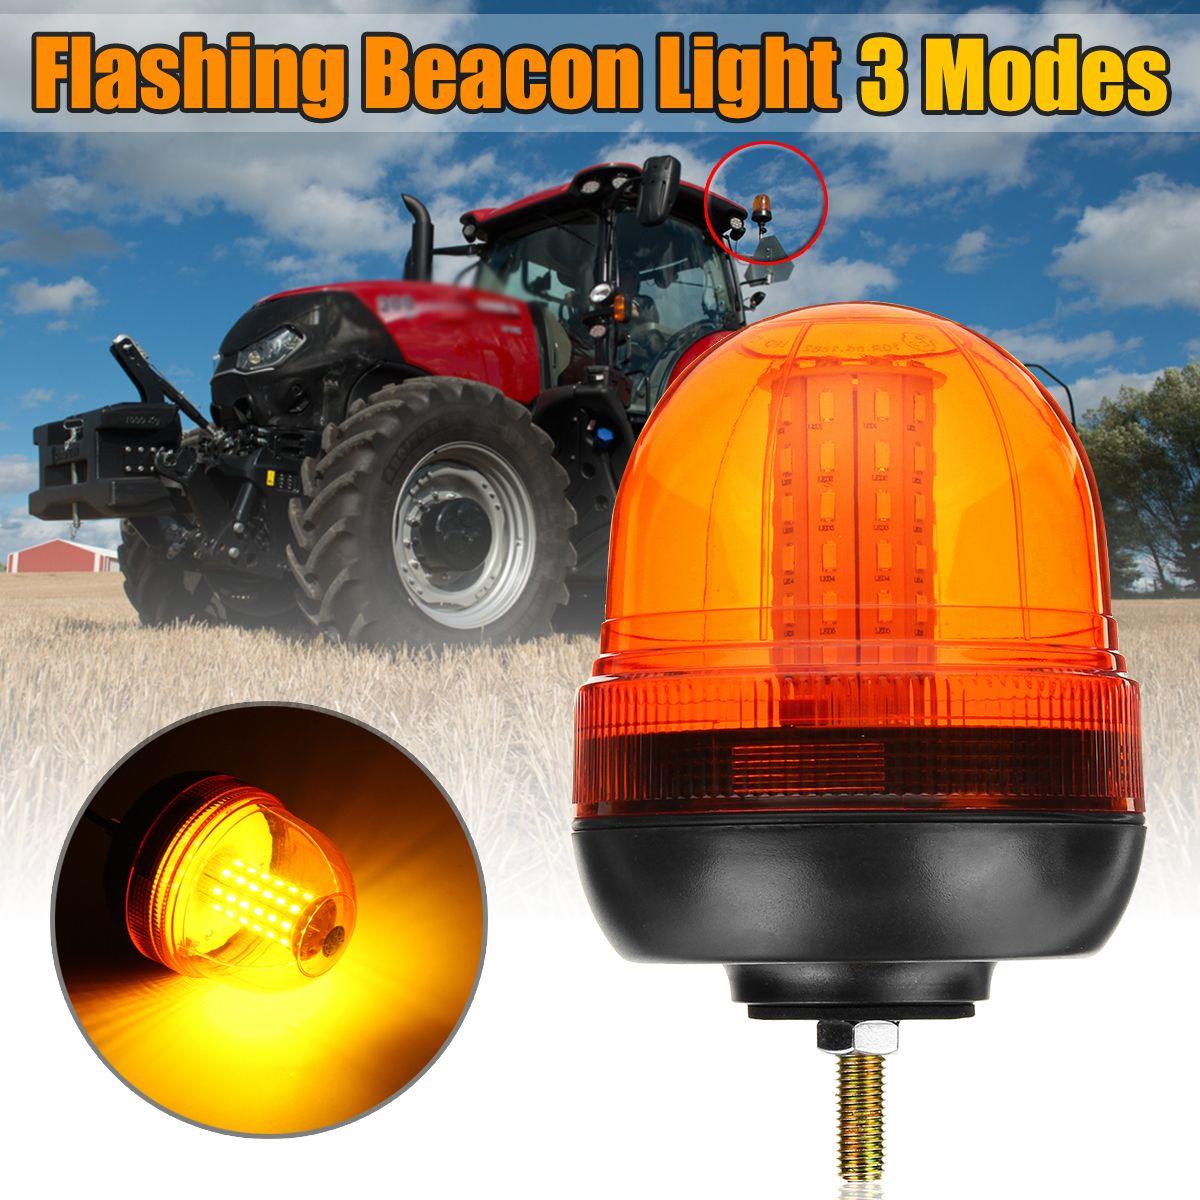 12-24V 60LED Flashing Yellow Beacon Warning Lamp Rotating Work Emergency Strobe Signal Light for Car Truck